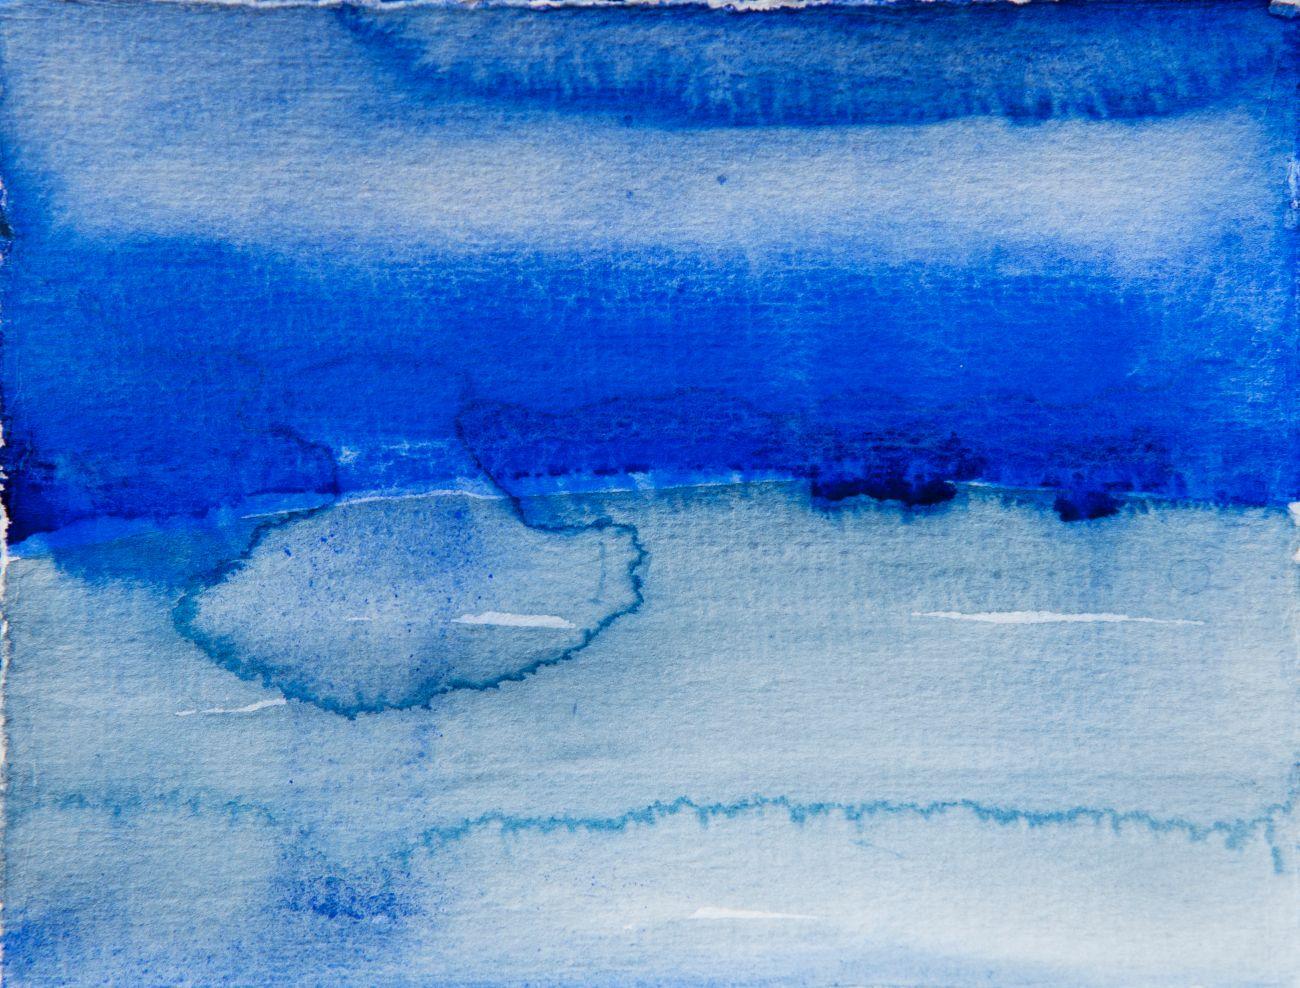 19 x 13 cm, akvarel na papieri 1